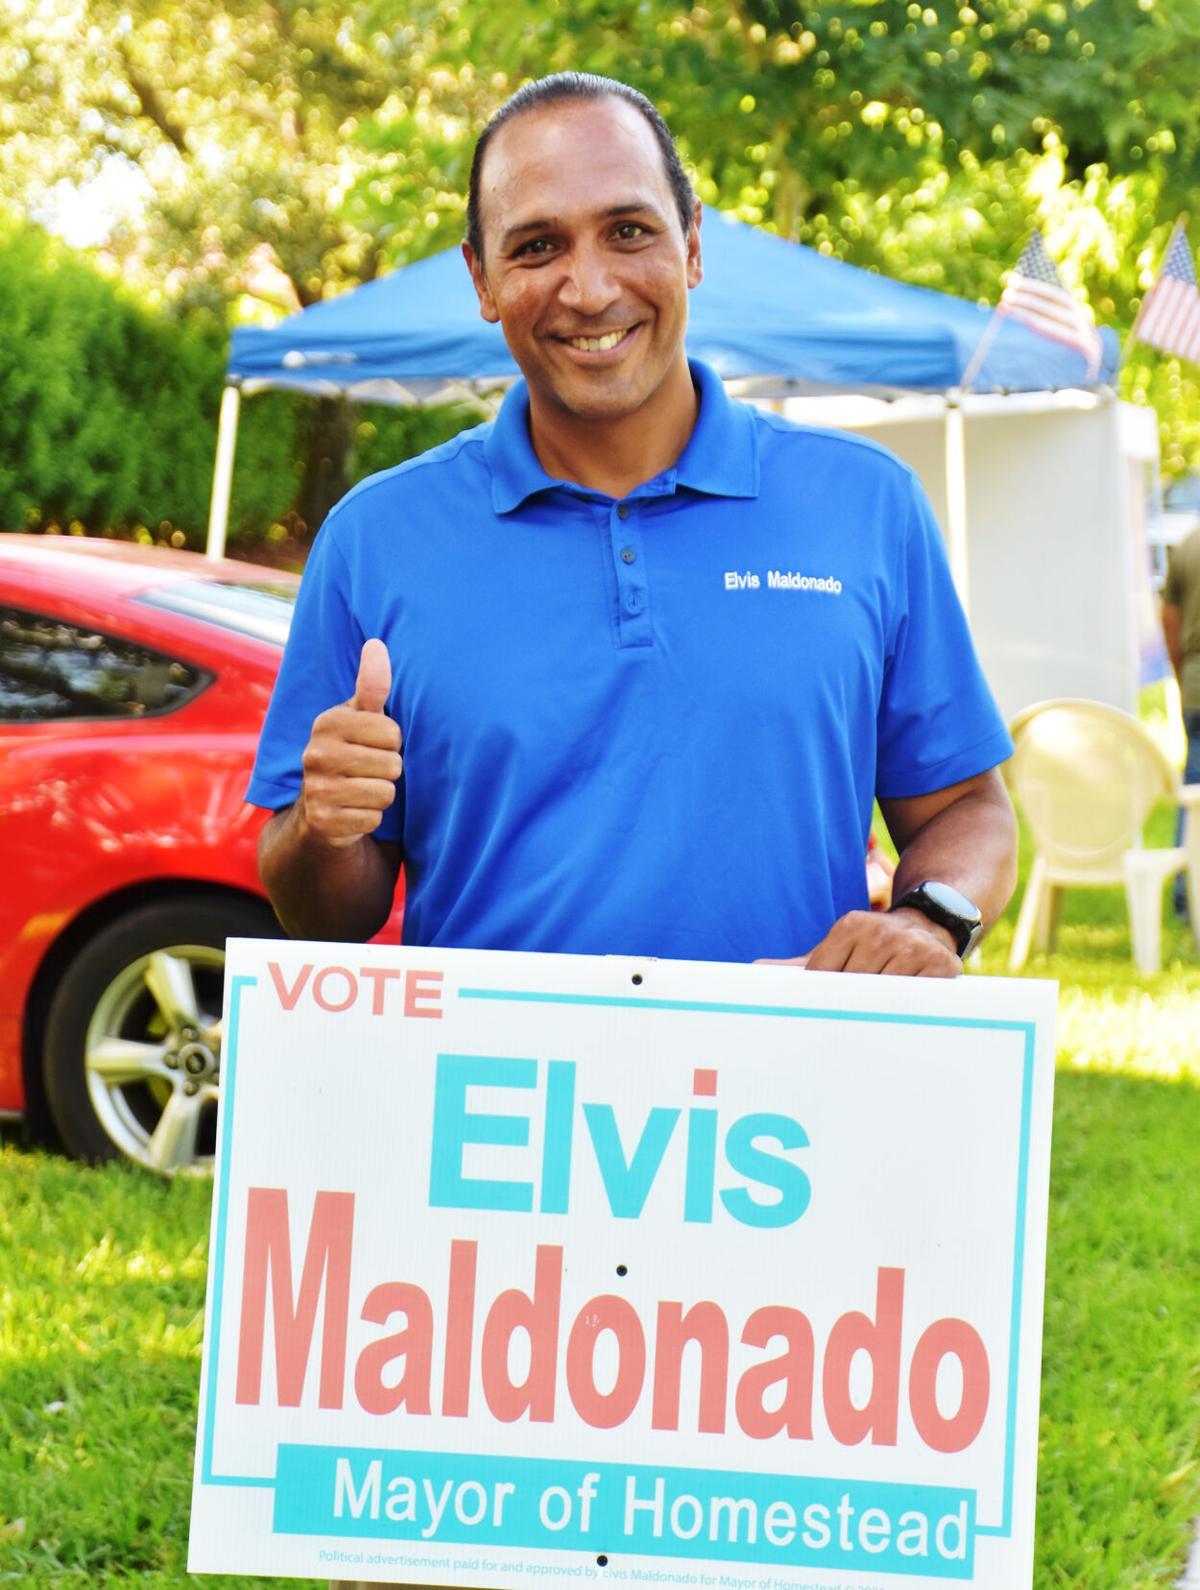 Elvis Maldonado (right) at the polls on Tuesday.